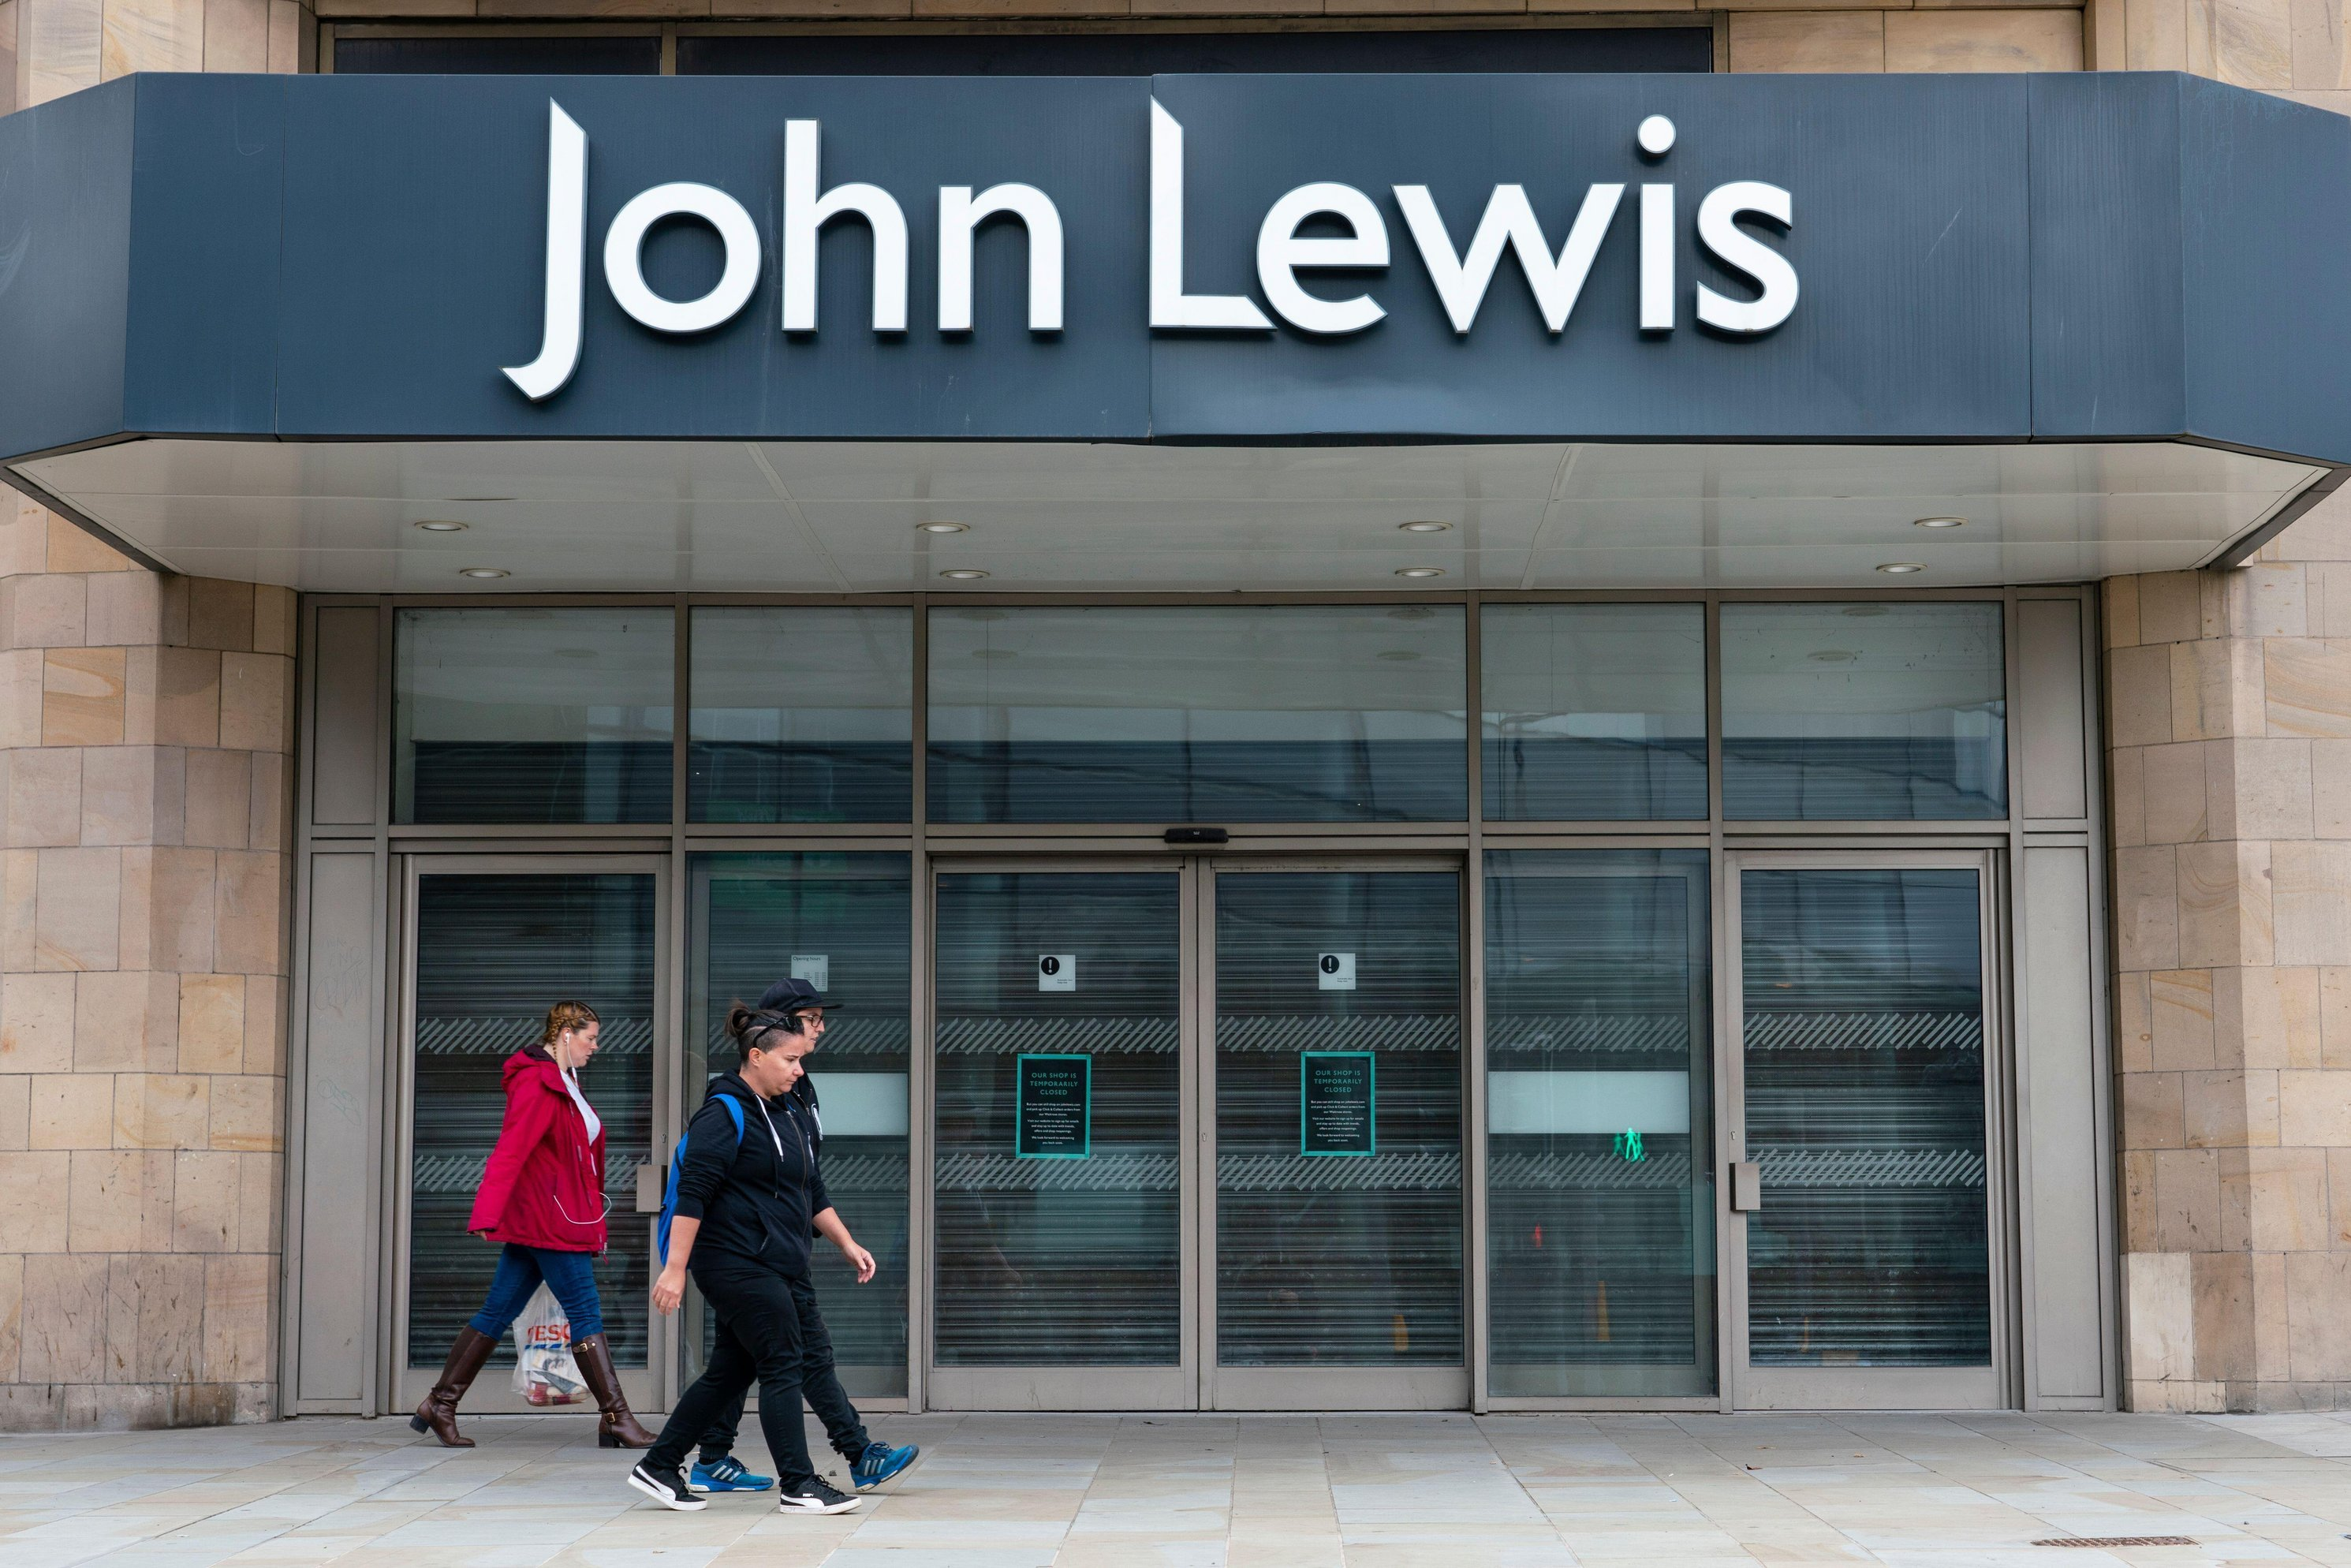 Exterior view of John Lewis store in Edinburgh